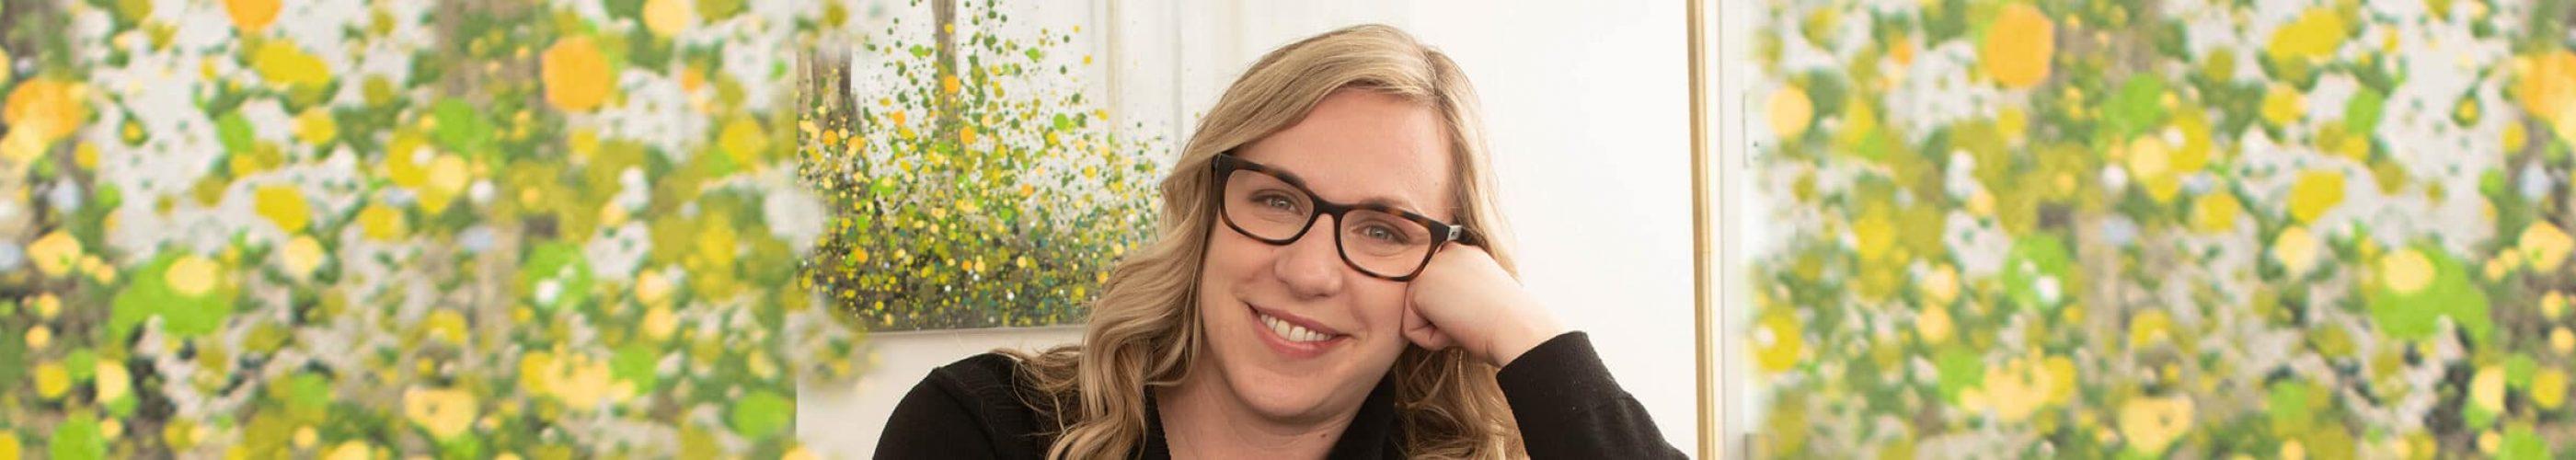 Ashley Barlow Psychological Header